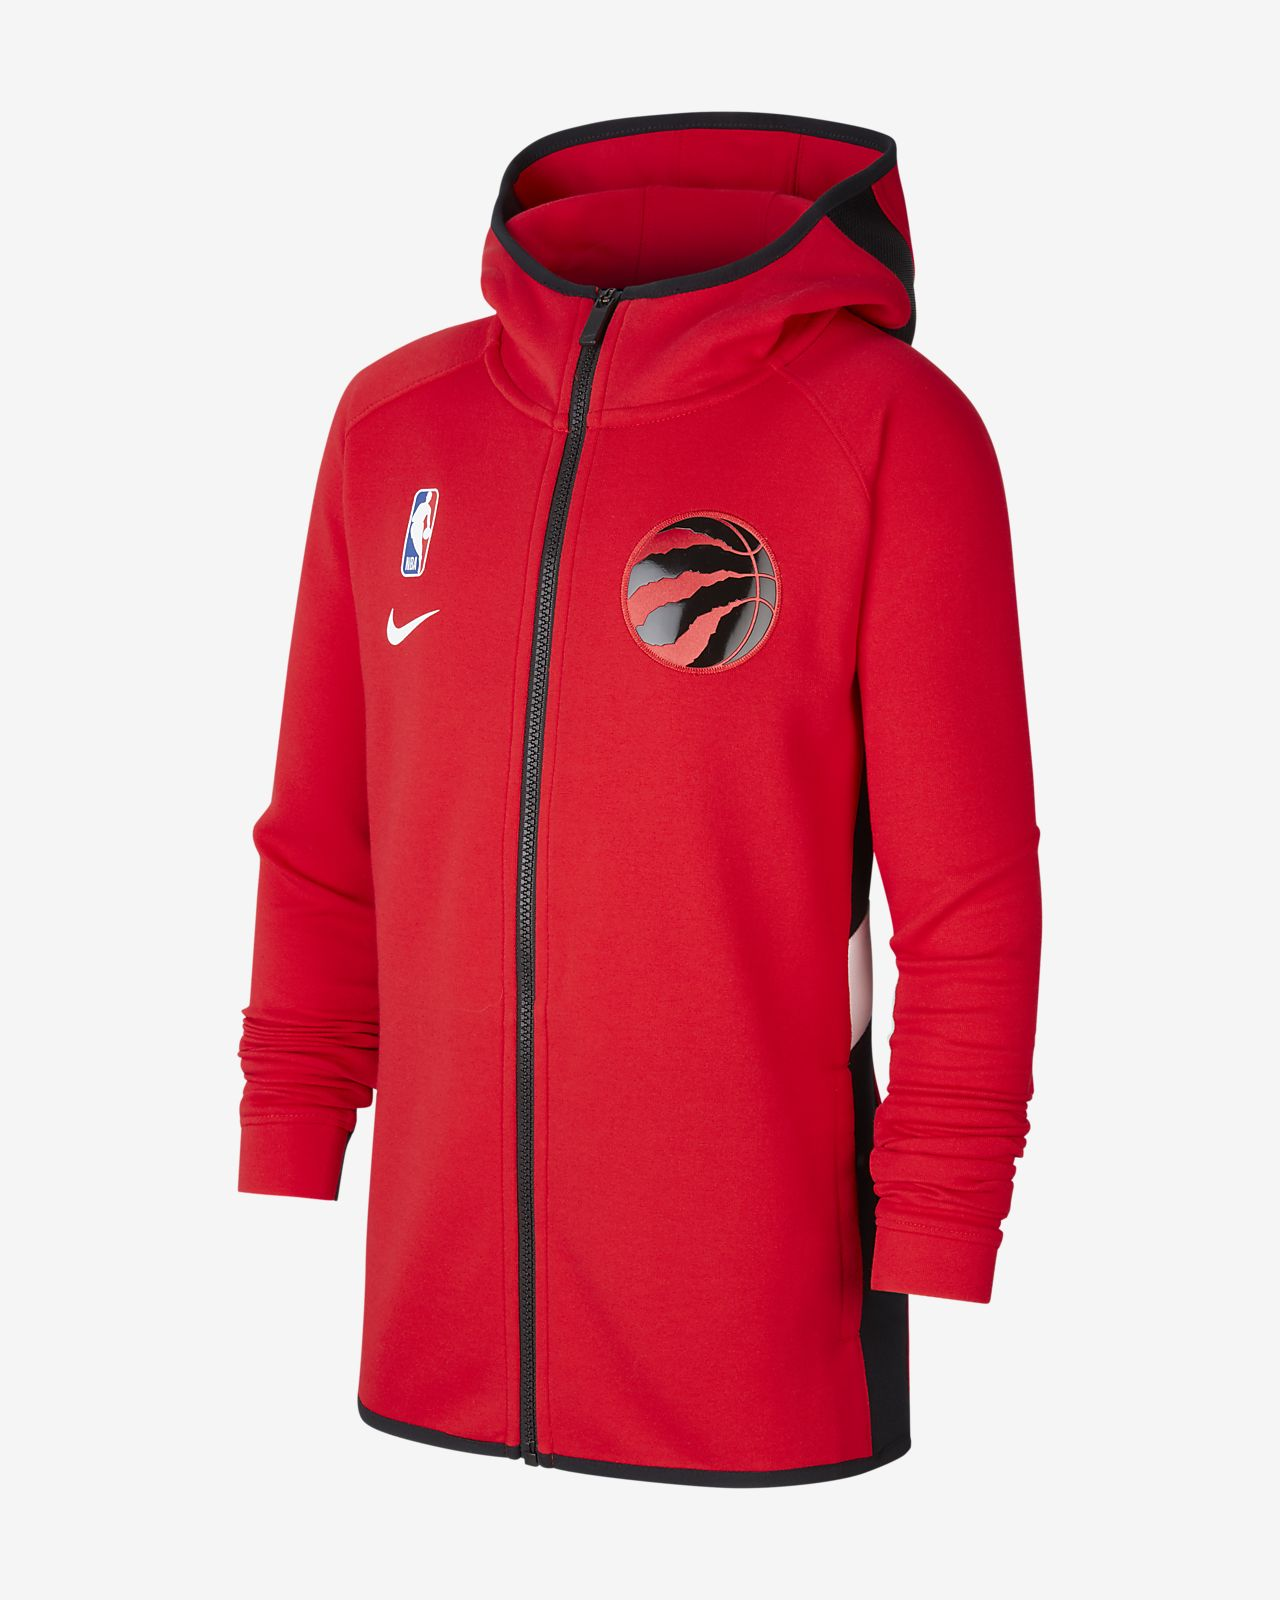 Raptors Showtime Older Kids' Nike Dri-FIT NBA Hoodie